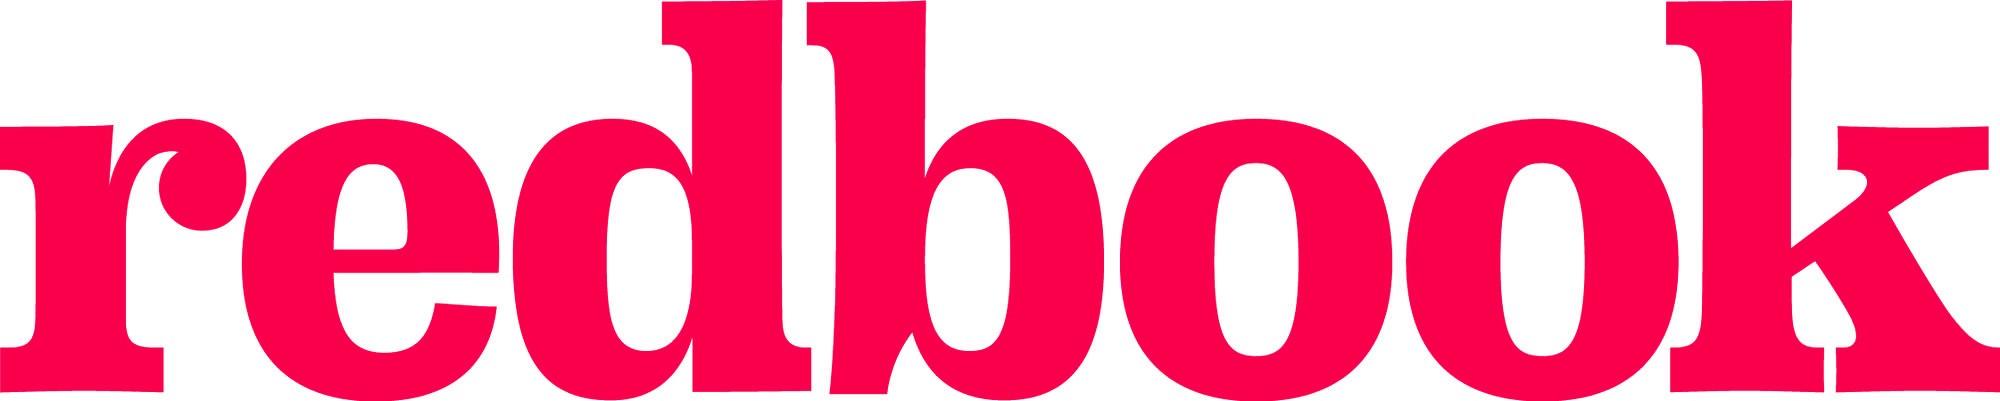 Redbook Magazine logo